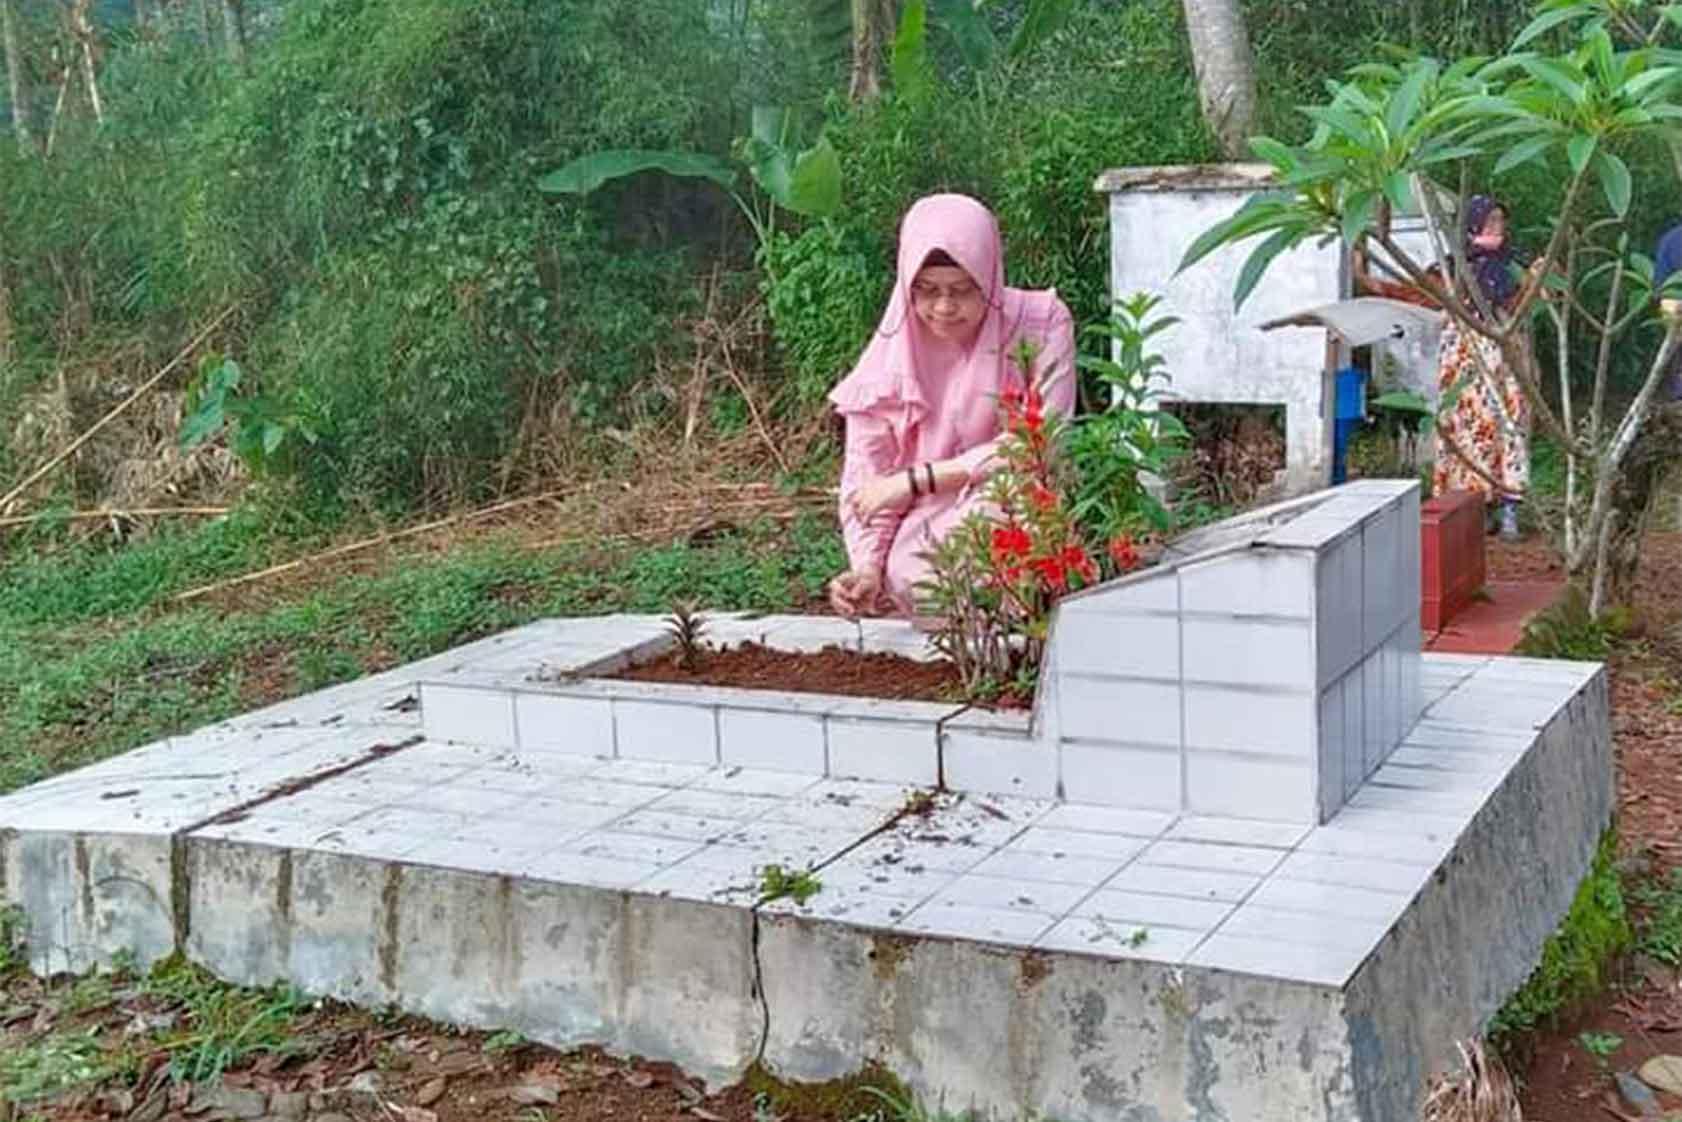 Dewi Banowati